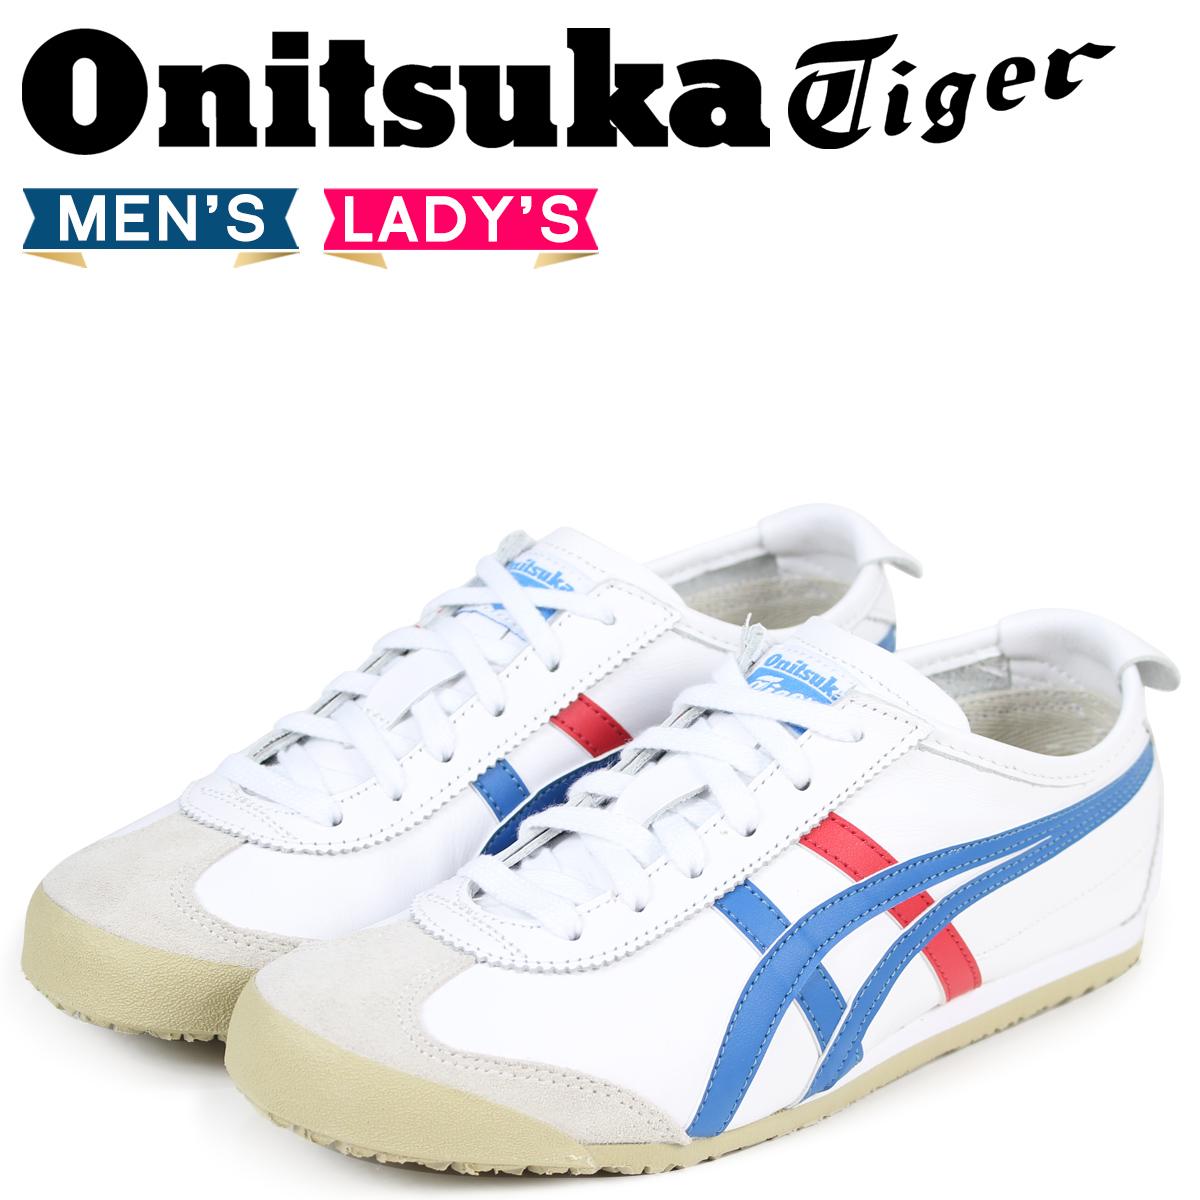 Onitsuka Tiger メキシコ 66 オニツカタイガー MEXICO 66 スニーカー メンズ レディース DL202-0146 THL202-0146 DL408-0146 ホワイト 白 [3/2 追加入荷]